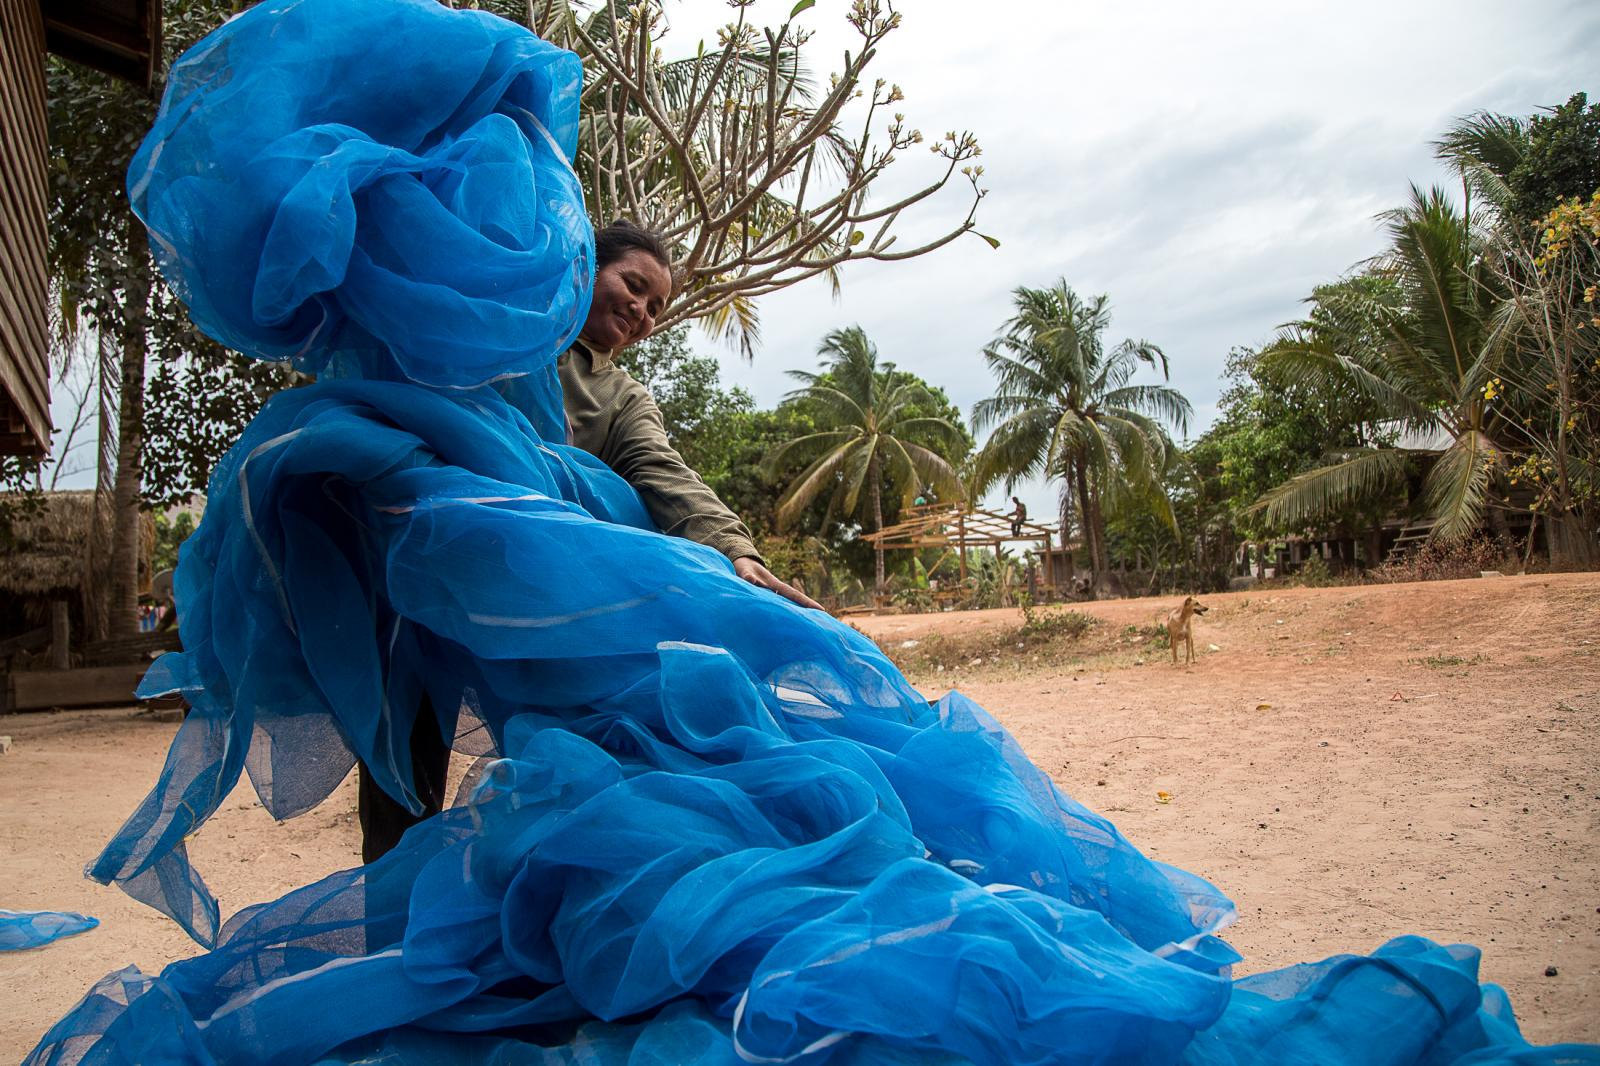 Photography image - Loading 003_Im_Chaem-Cambodia_Omar_Havana.jpg